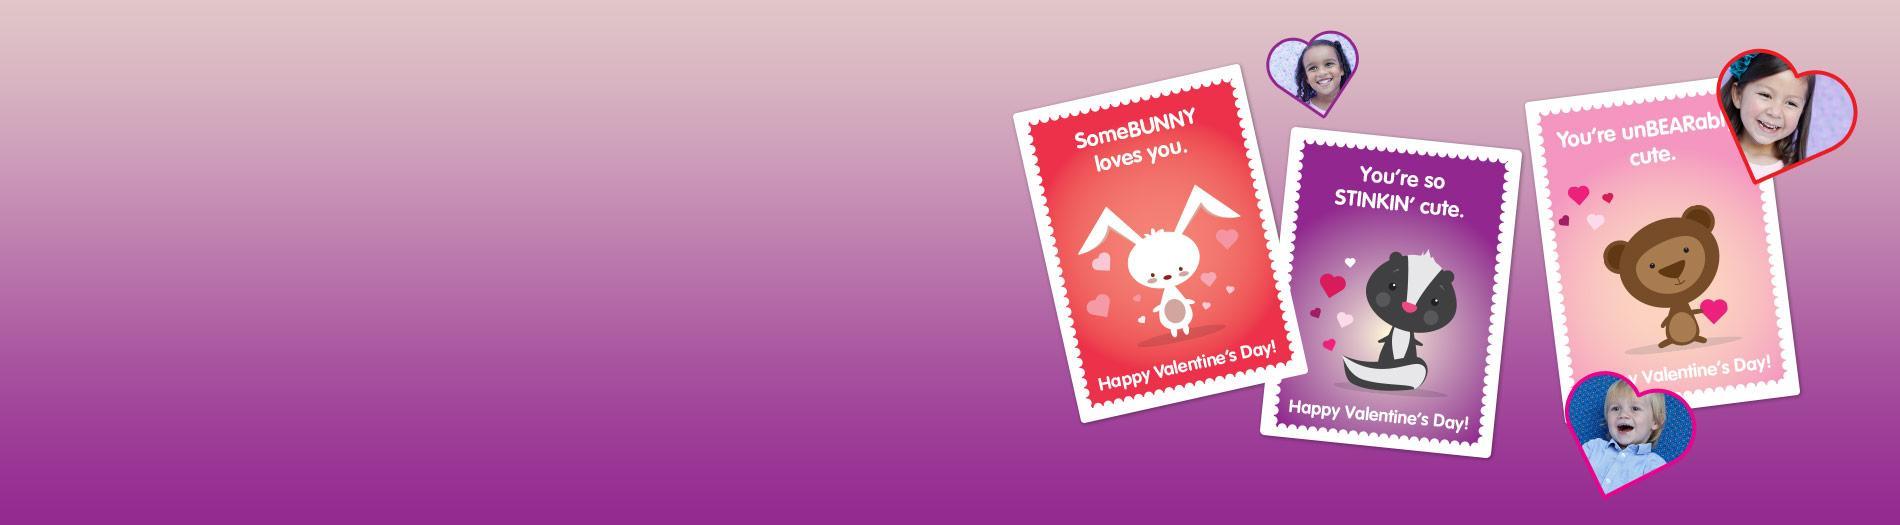 CHLA-Valentines-Day-SAC-2016-Desktop.jpg